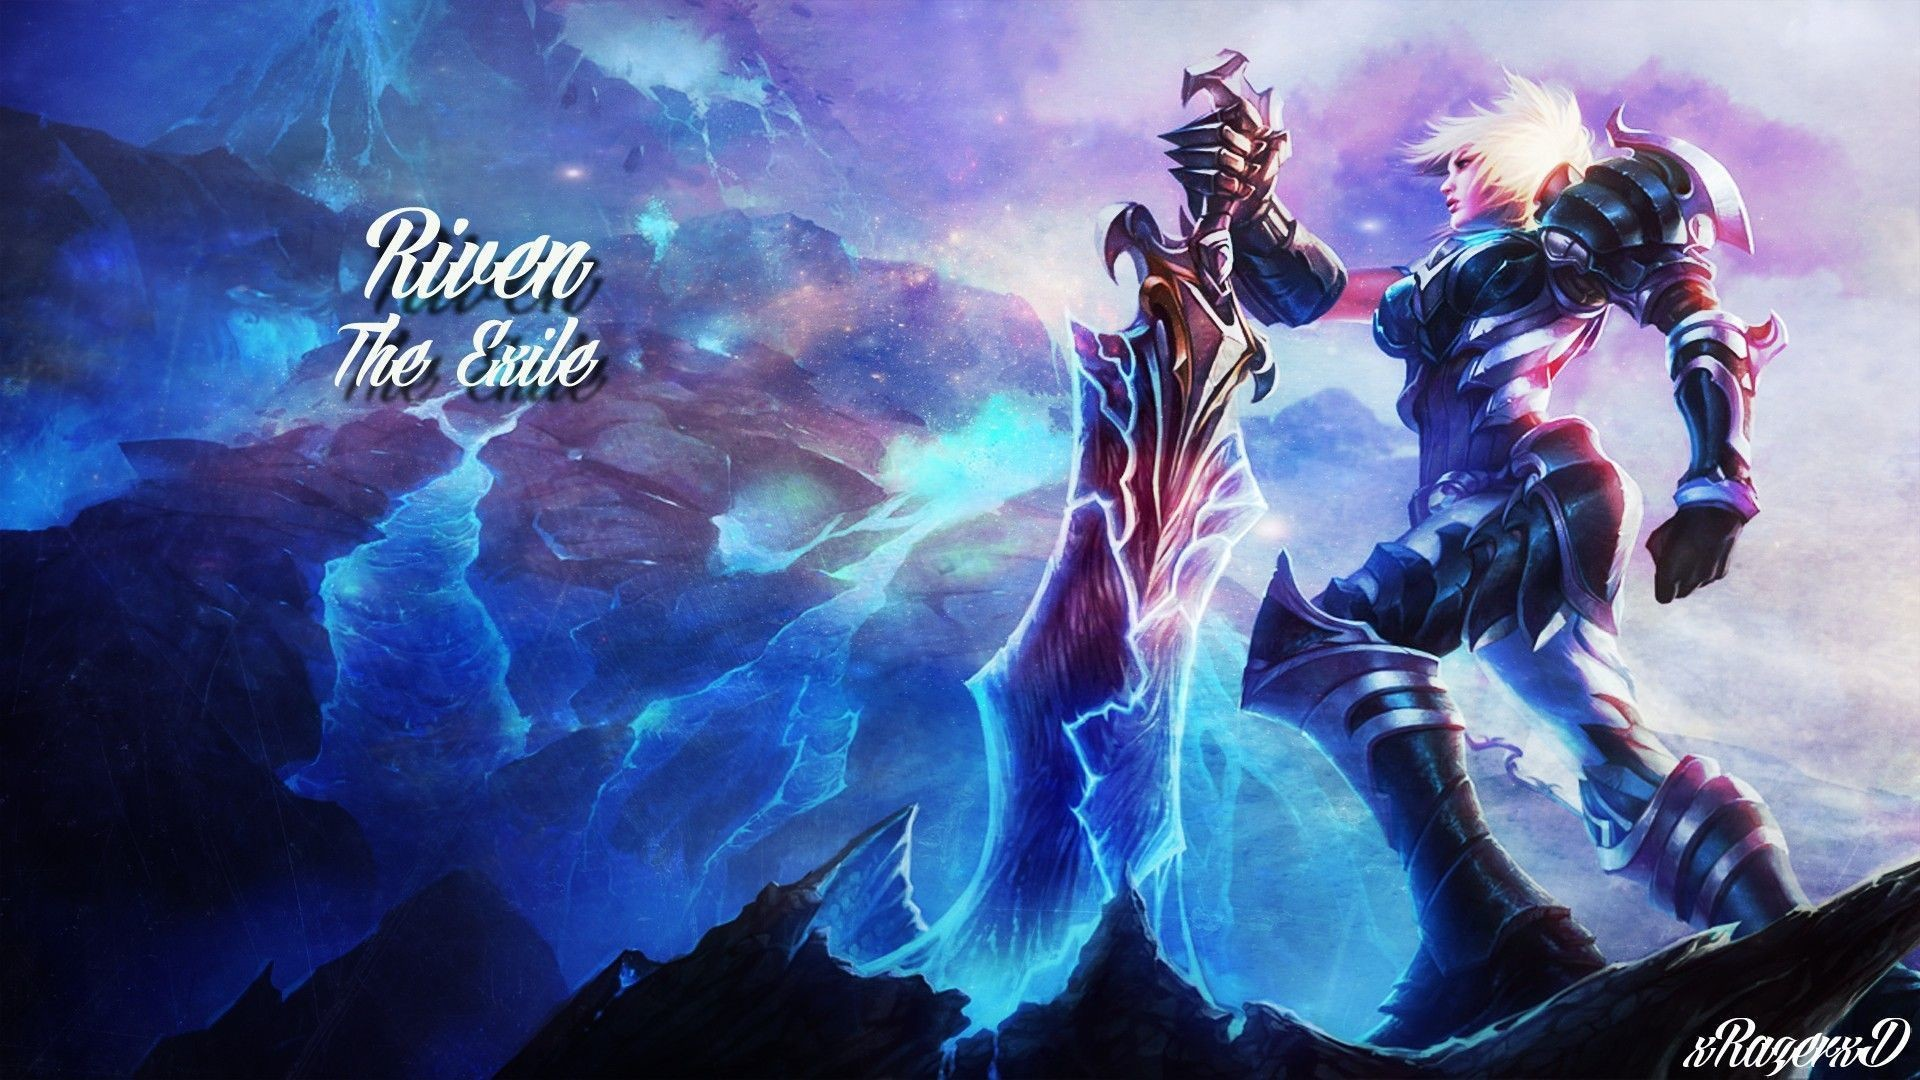 102 Riven (League Of Legends) HD Wallpapers